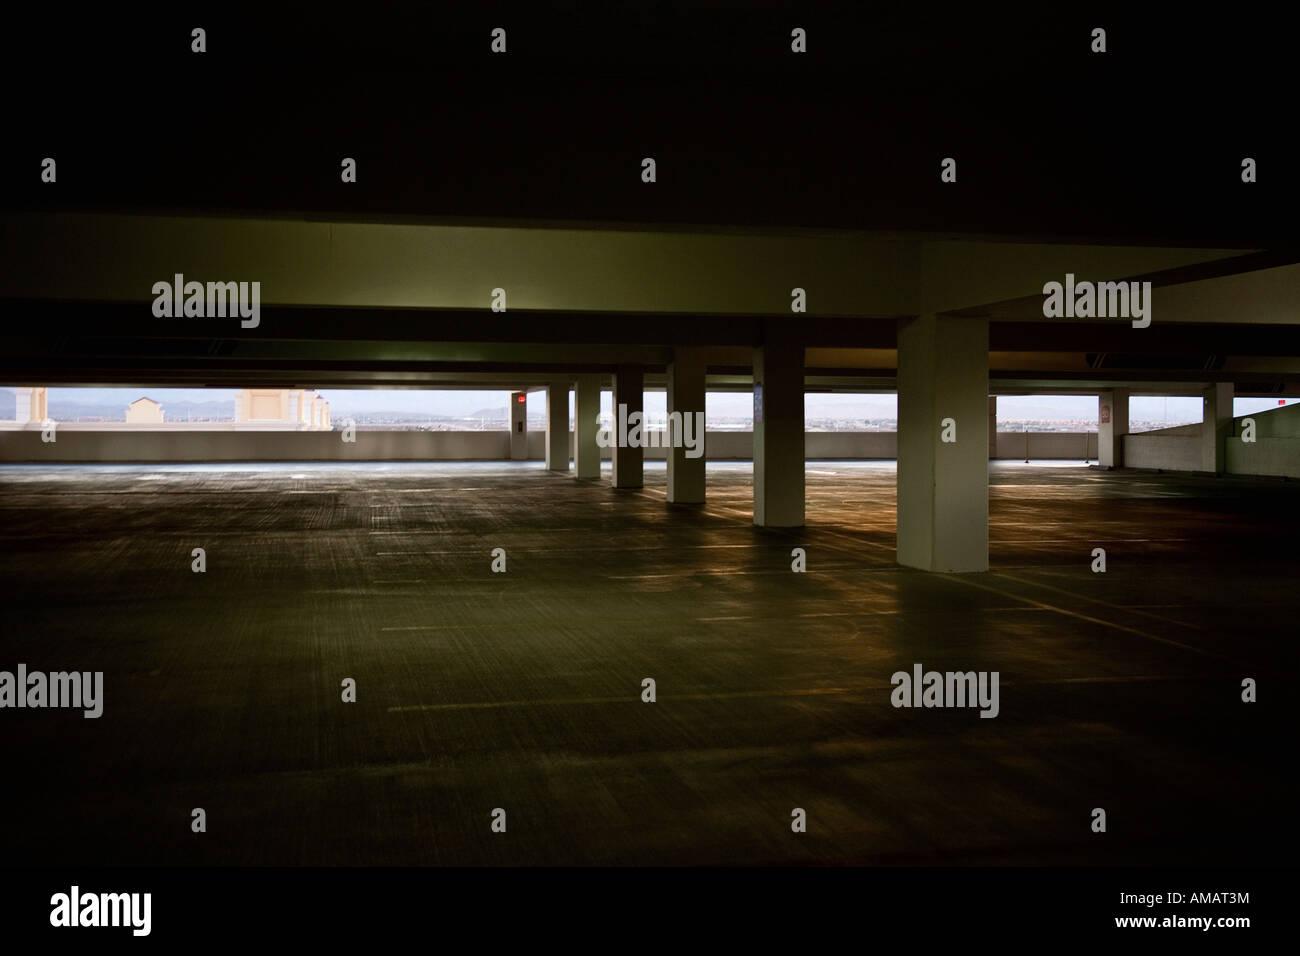 A multistory car park - Stock Image